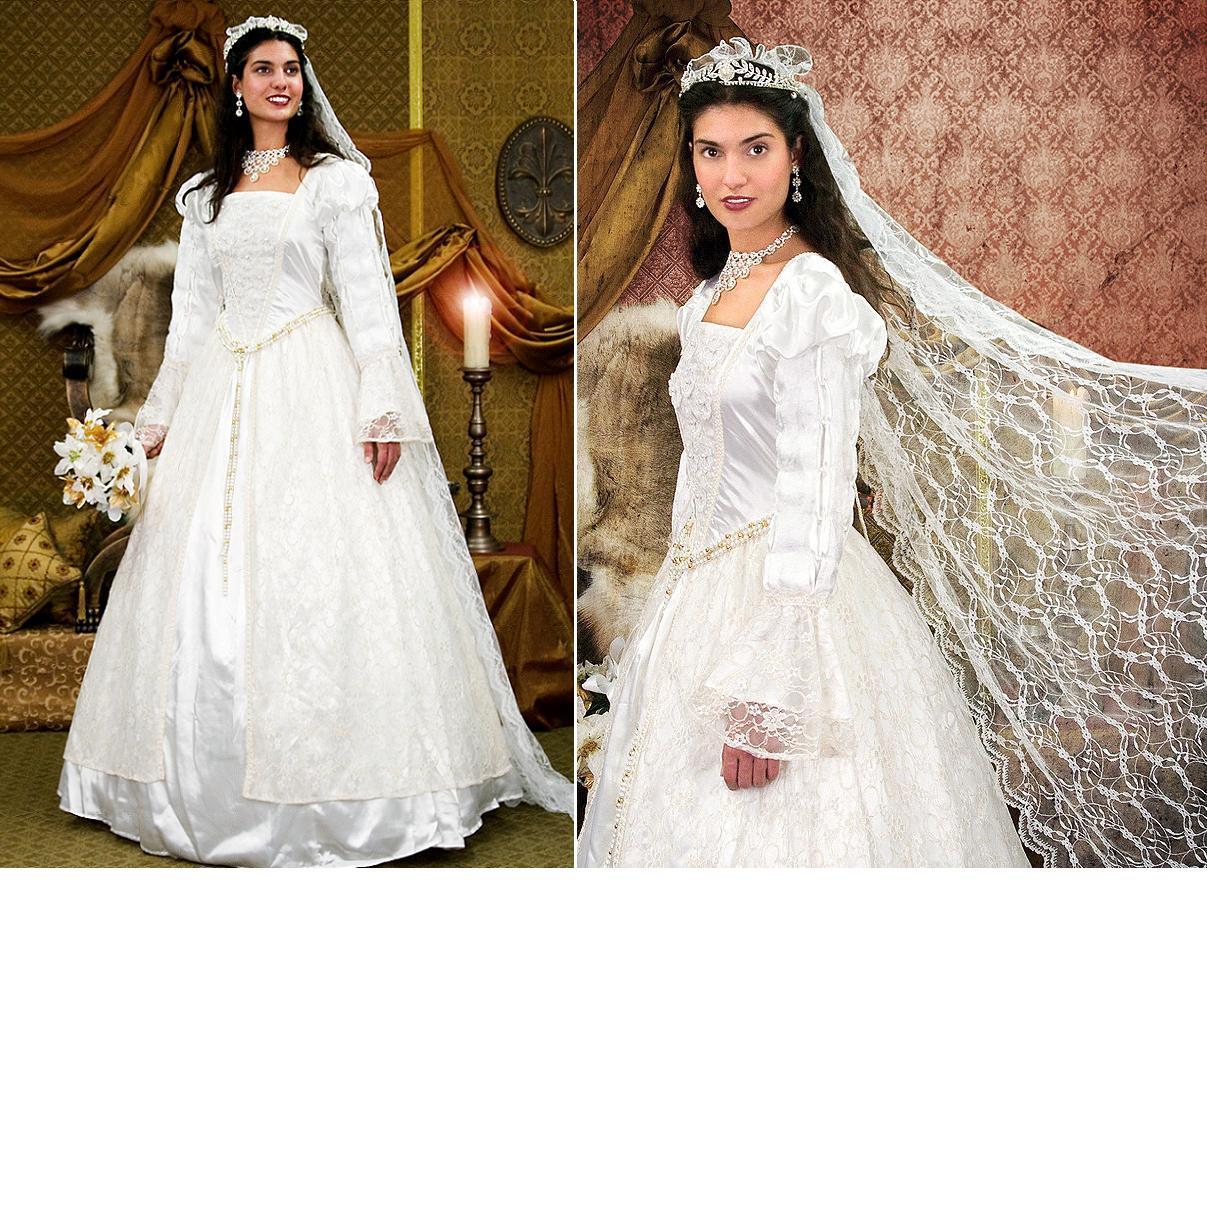 Medieval Wedding Dress Bridal Gown Silk Wedding Dress: Renaissance Wedding Gown & Veil